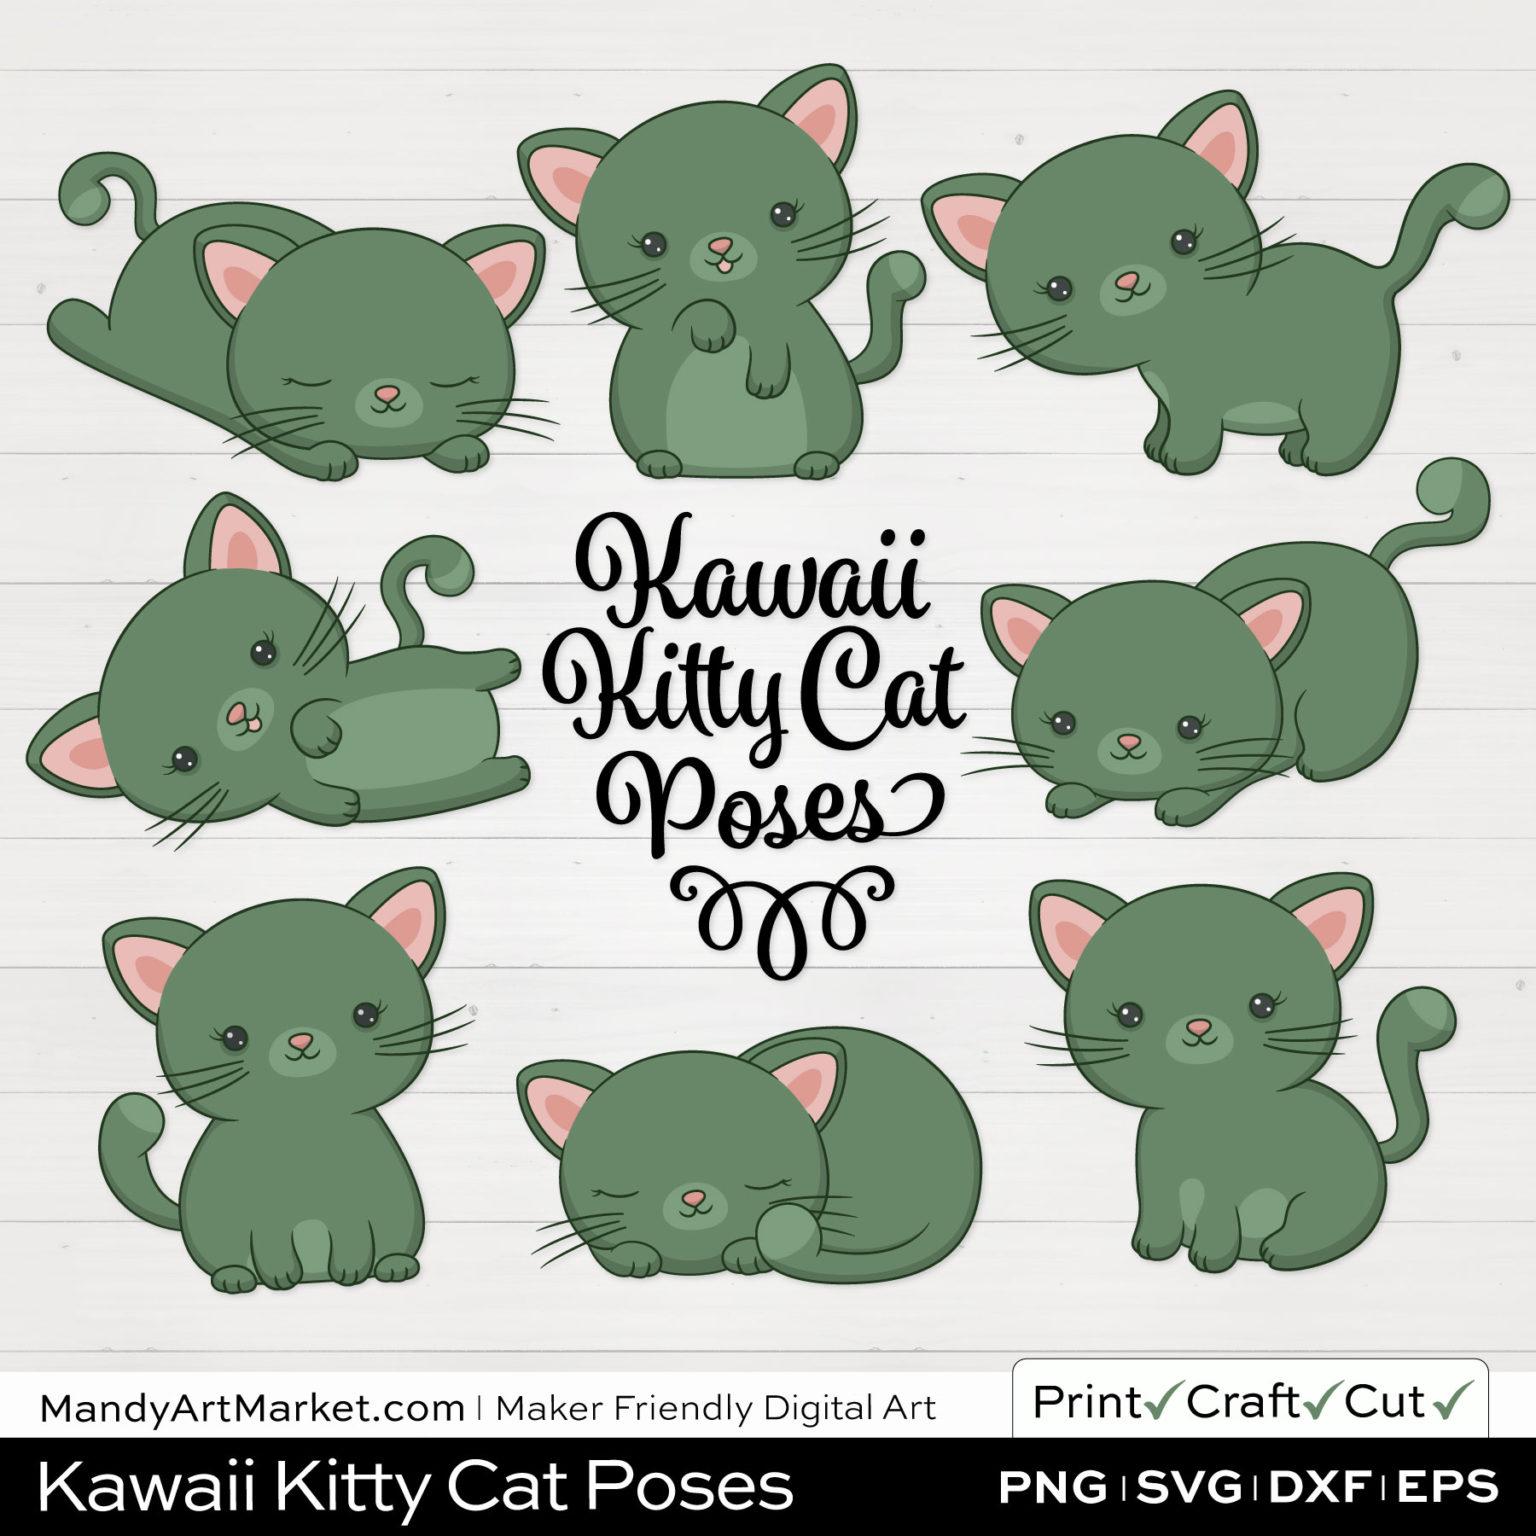 Artichoke Green Kawaii Kitty Cat Poses Clipart on White Background